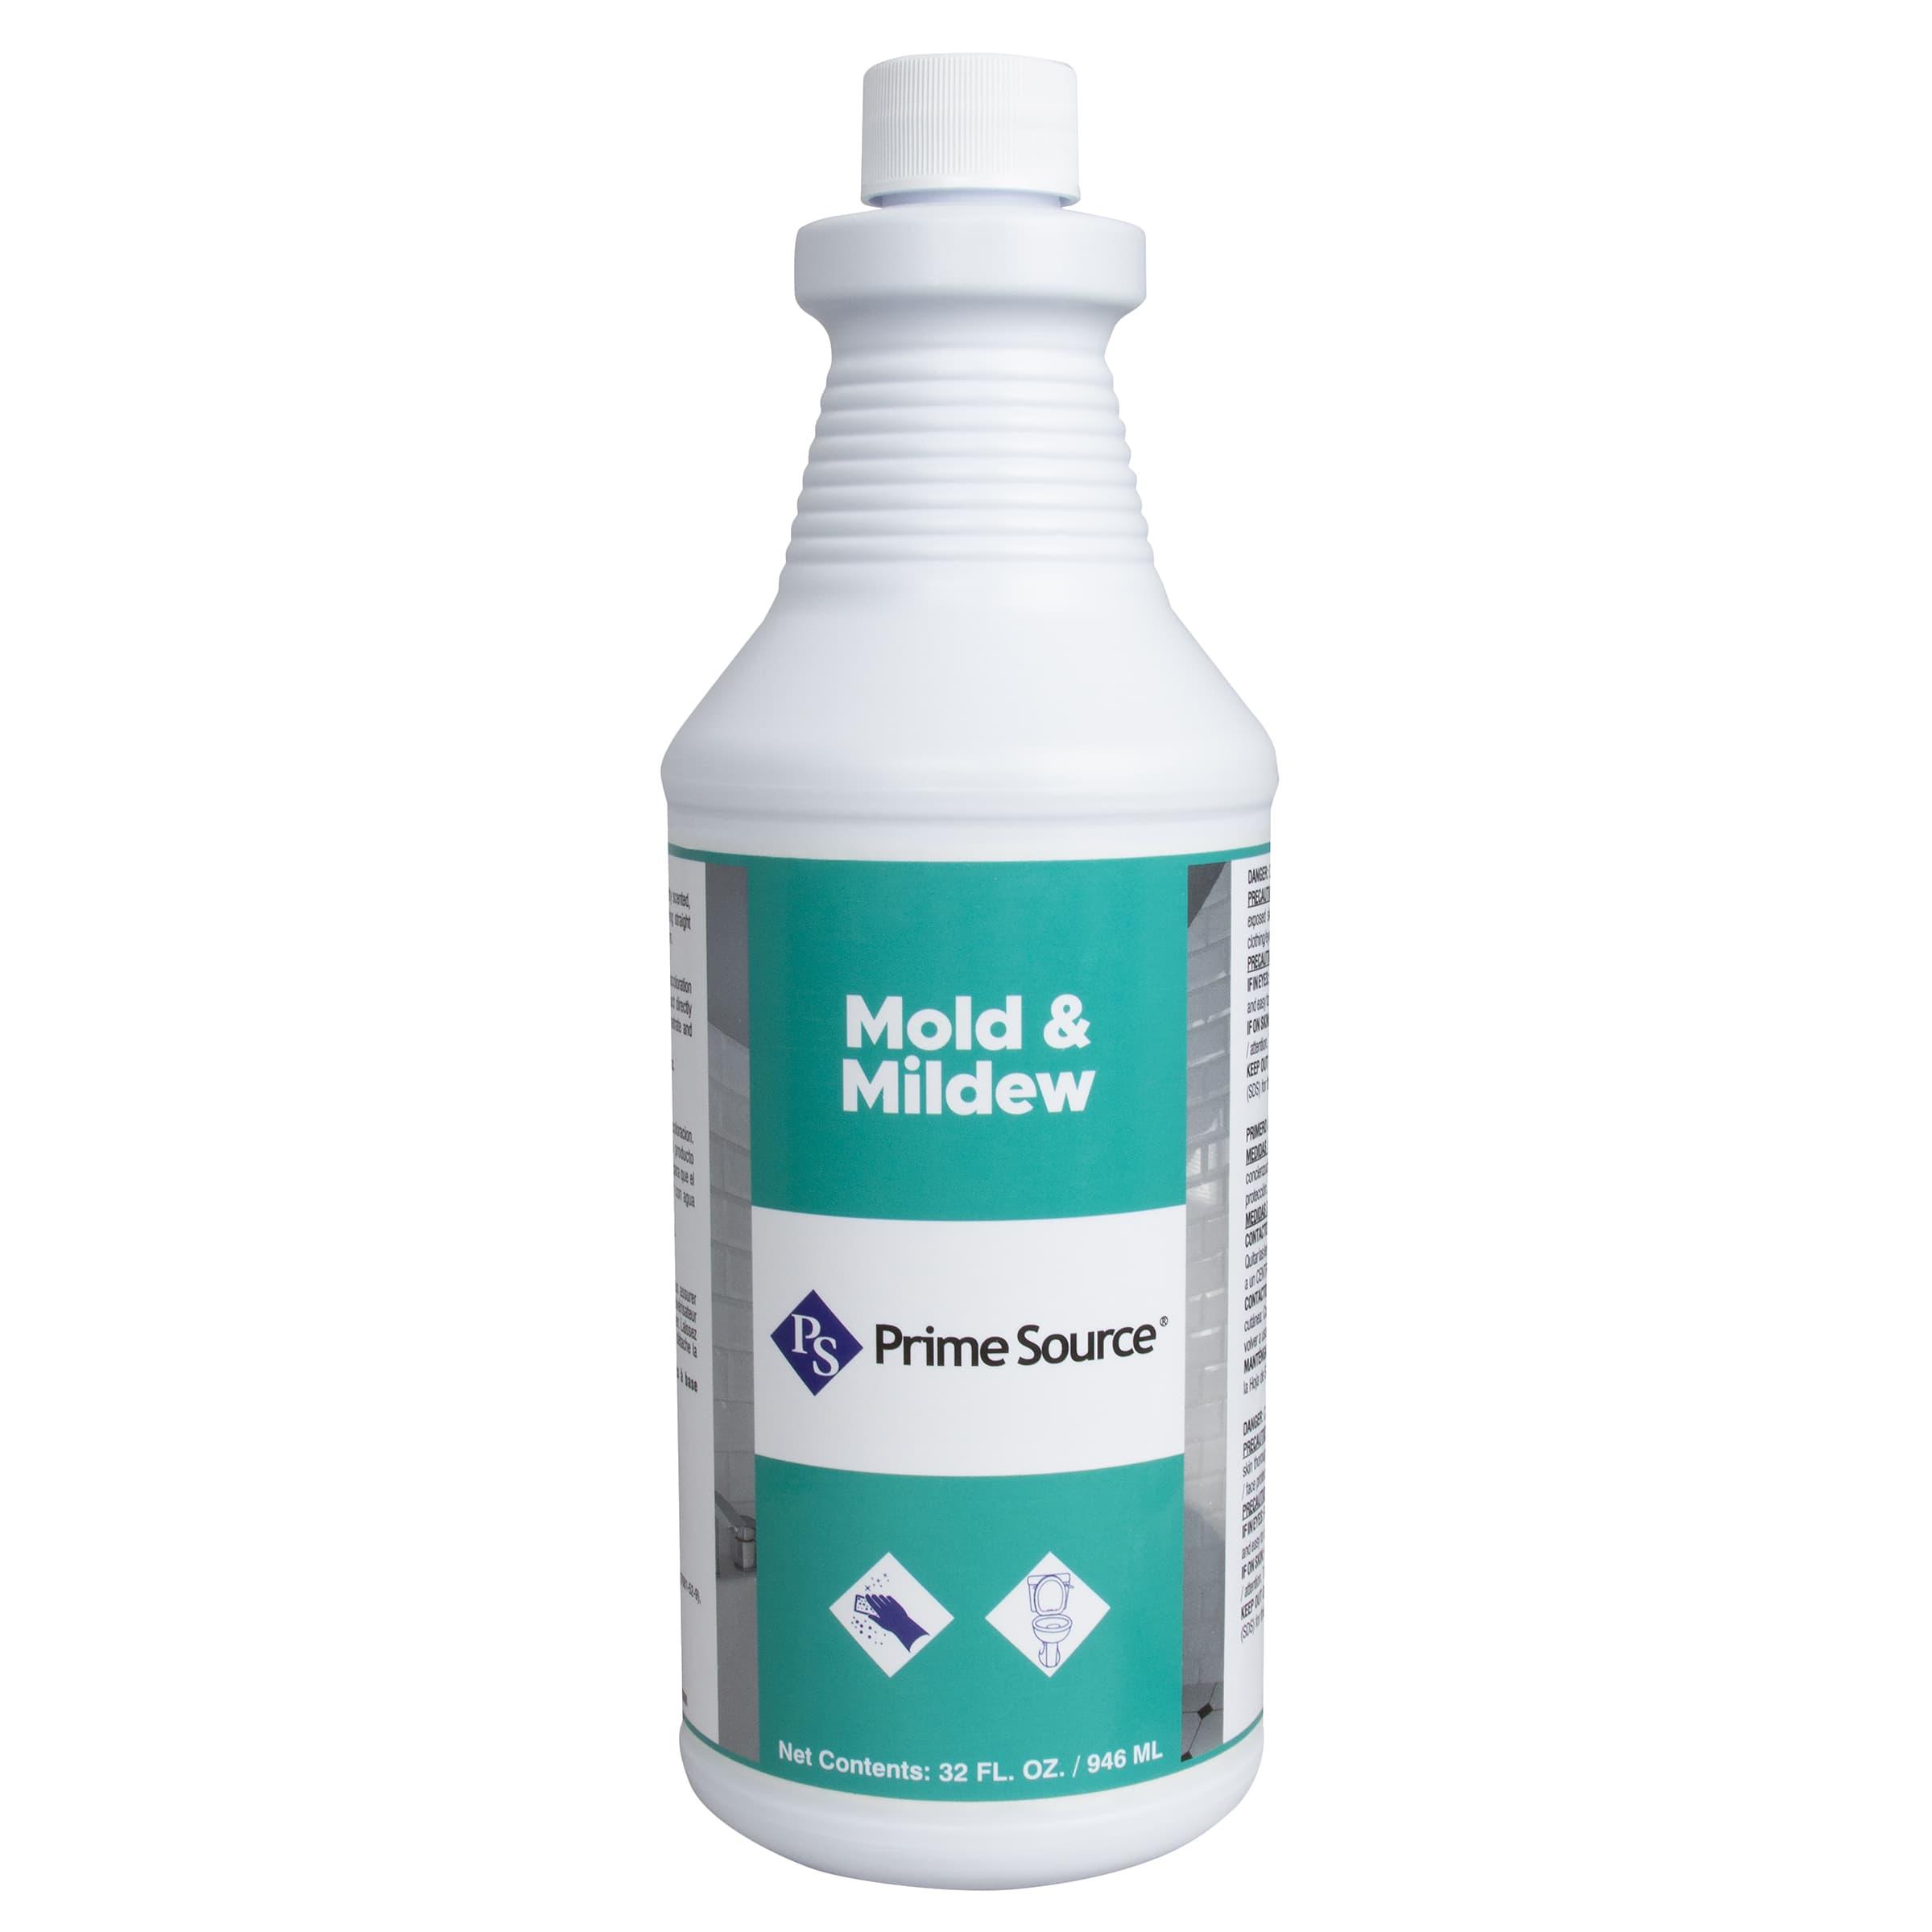 Mold Amp Mildew Cleaner Prime Source Brands